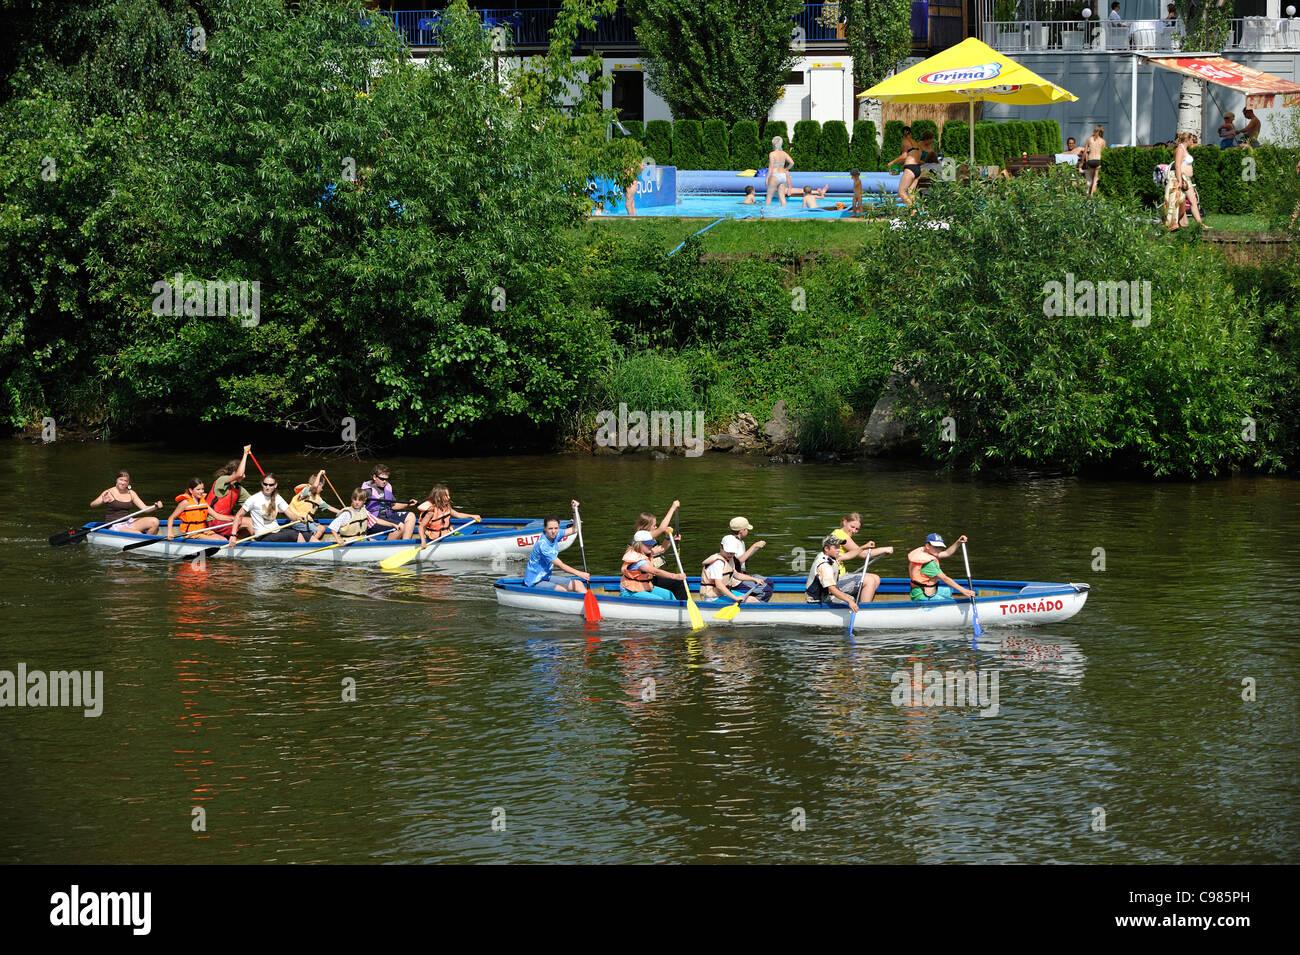 Boating canoe class, riverside recreational club River Vltava Podoli Prague Czech Republic - Stock Image